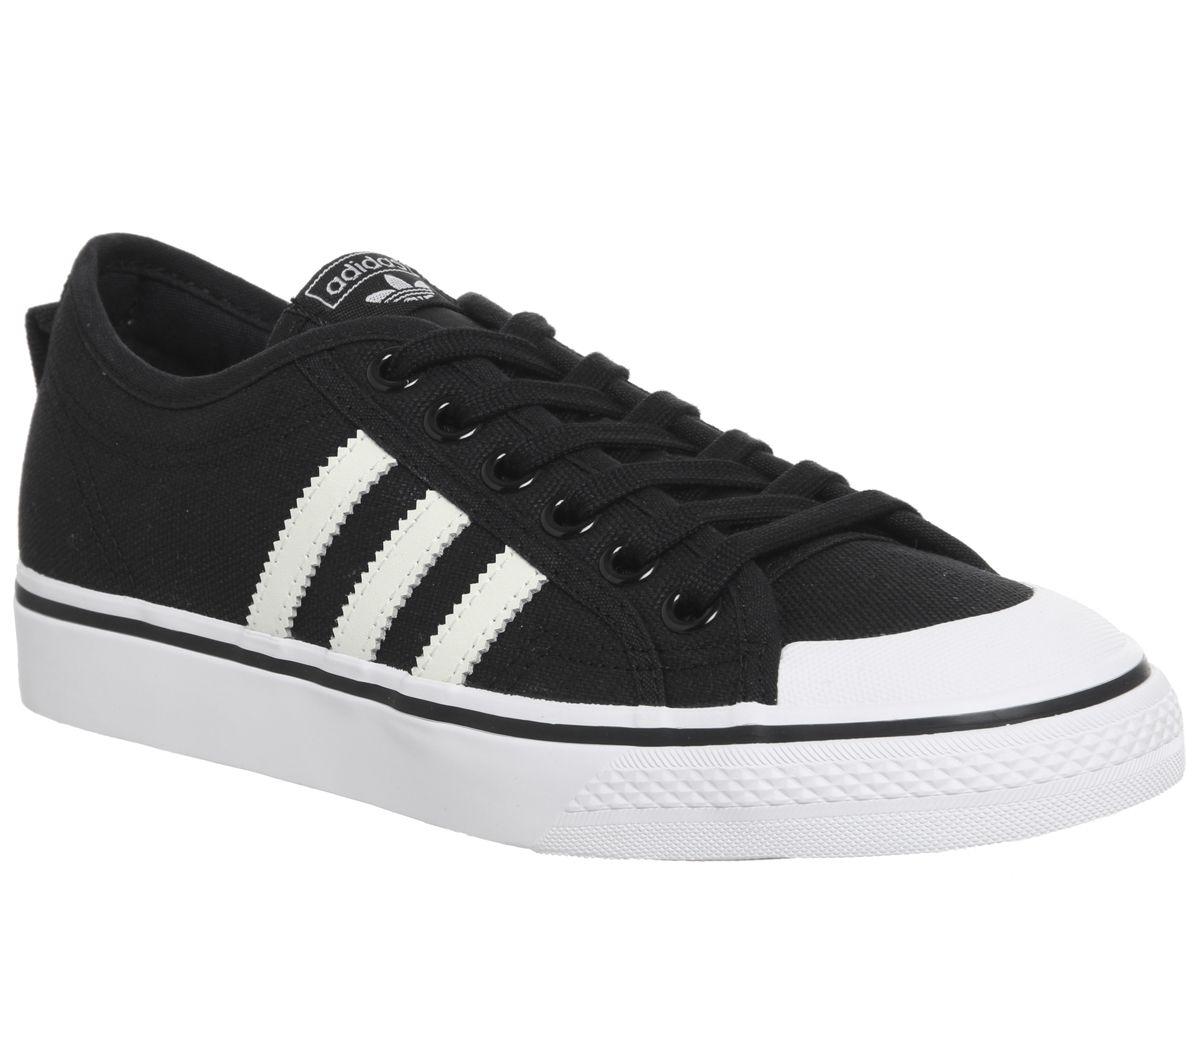 huge discount f9661 927c0 adidas Nizza Trainers Black White - Unisex Sports